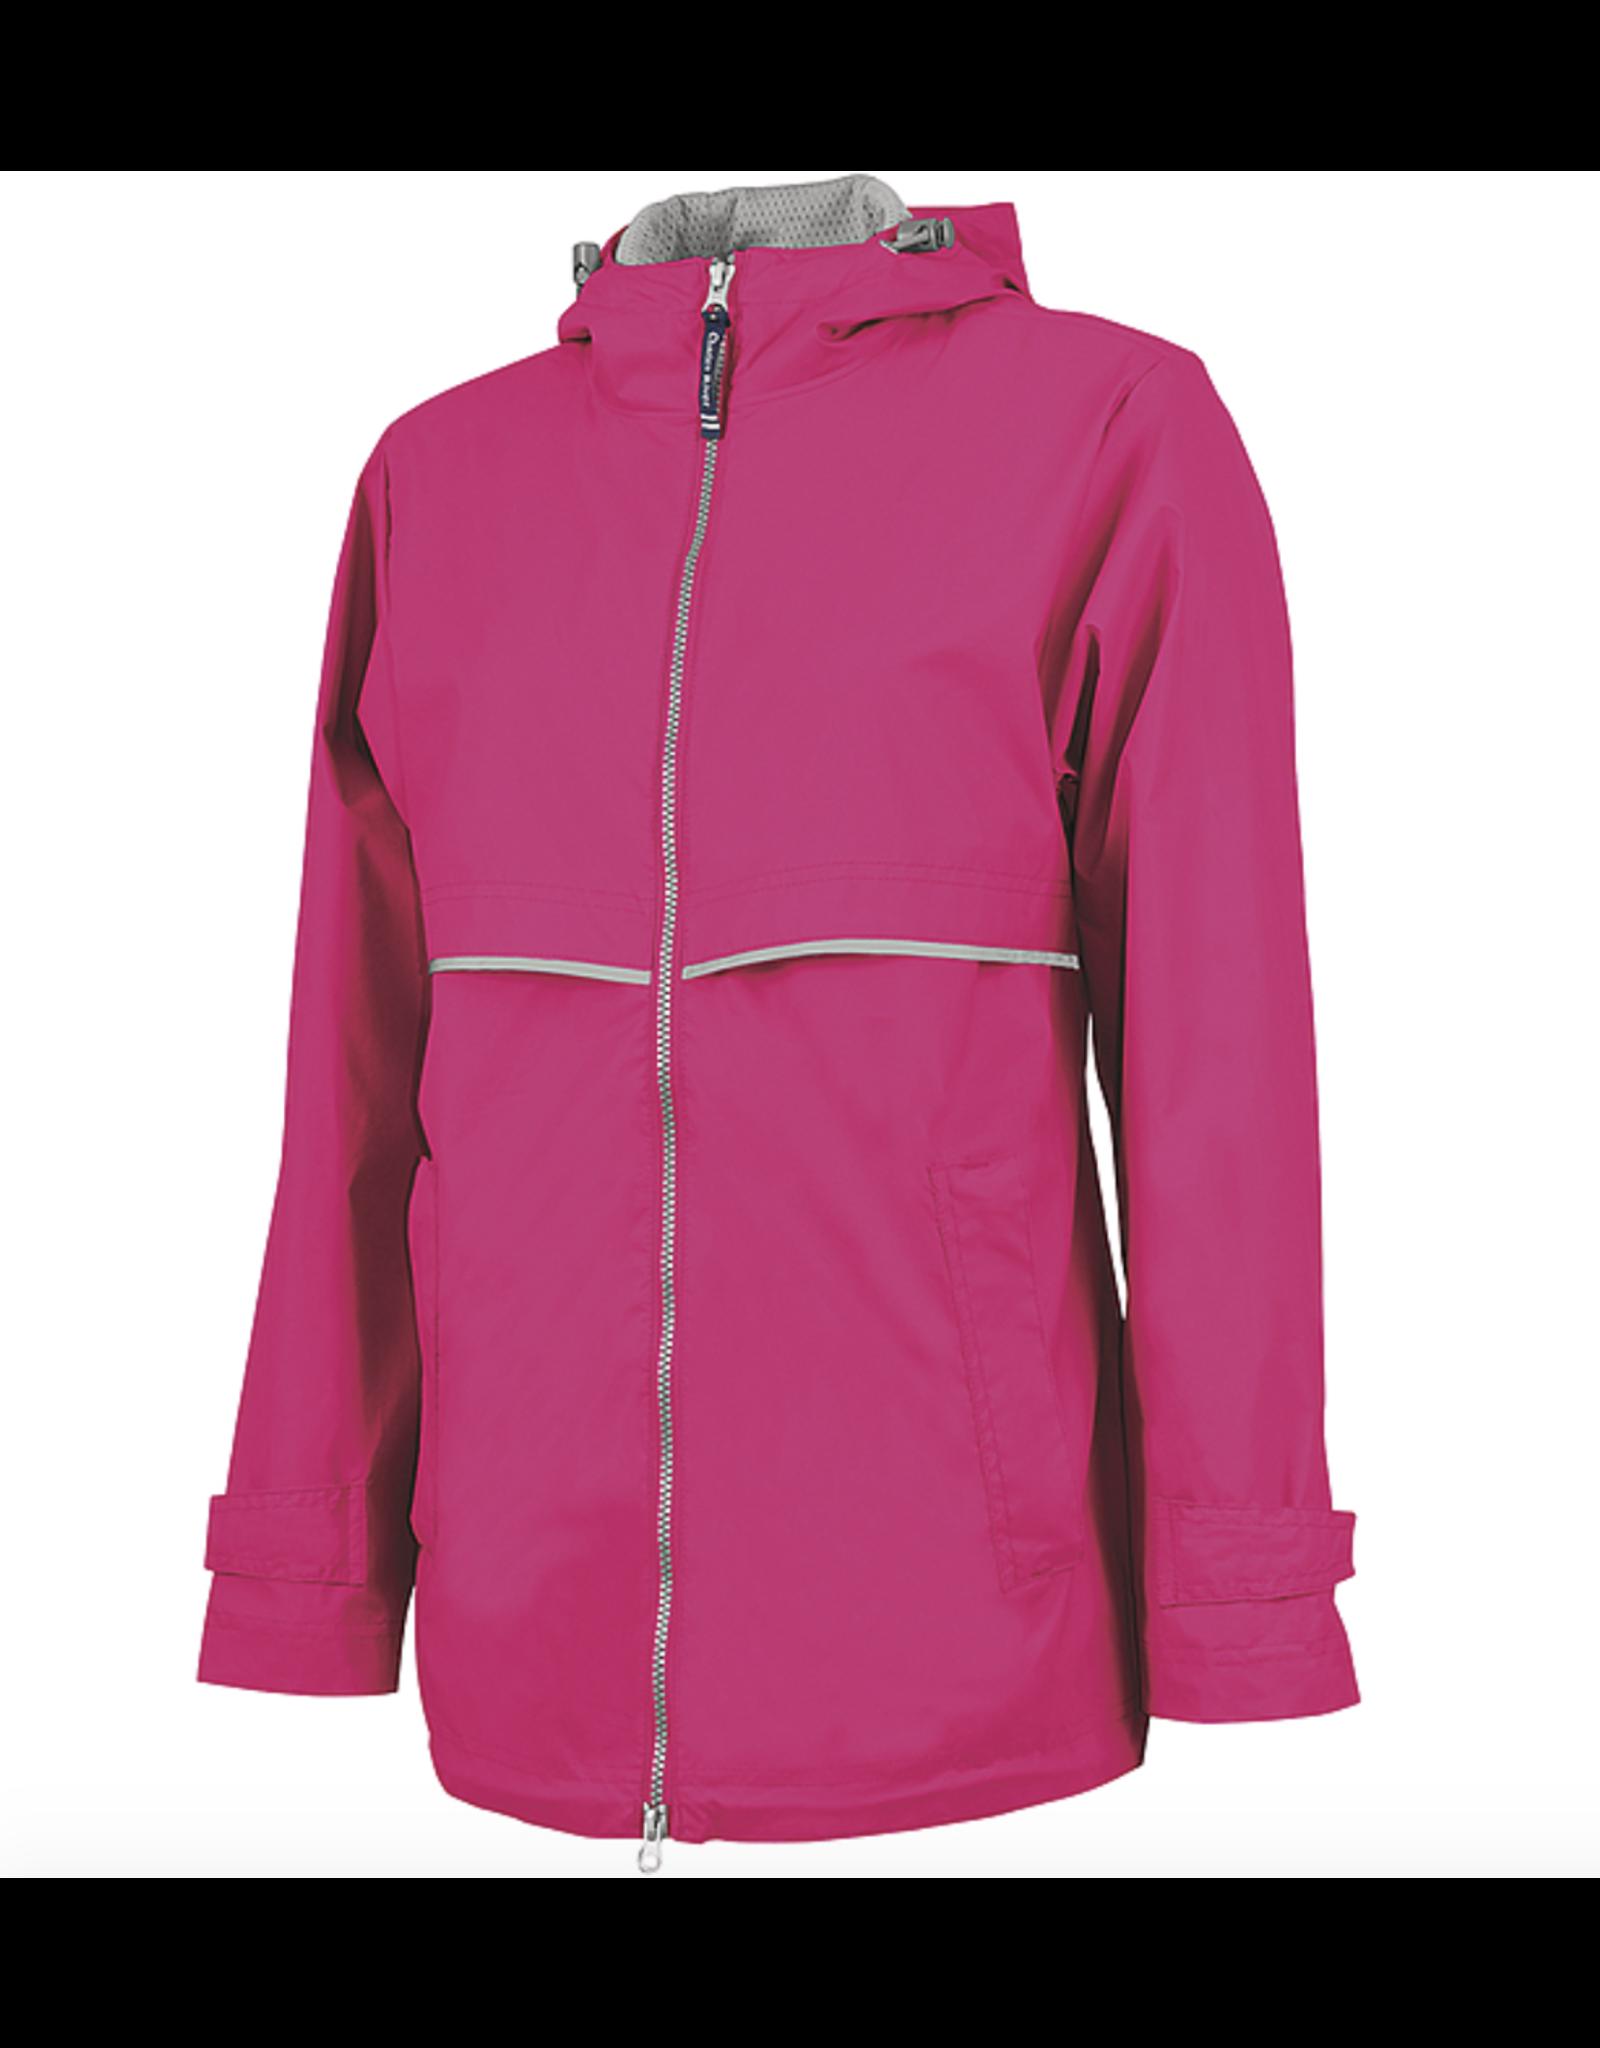 Charles River Women's Hot Pink Charles River Raincoat